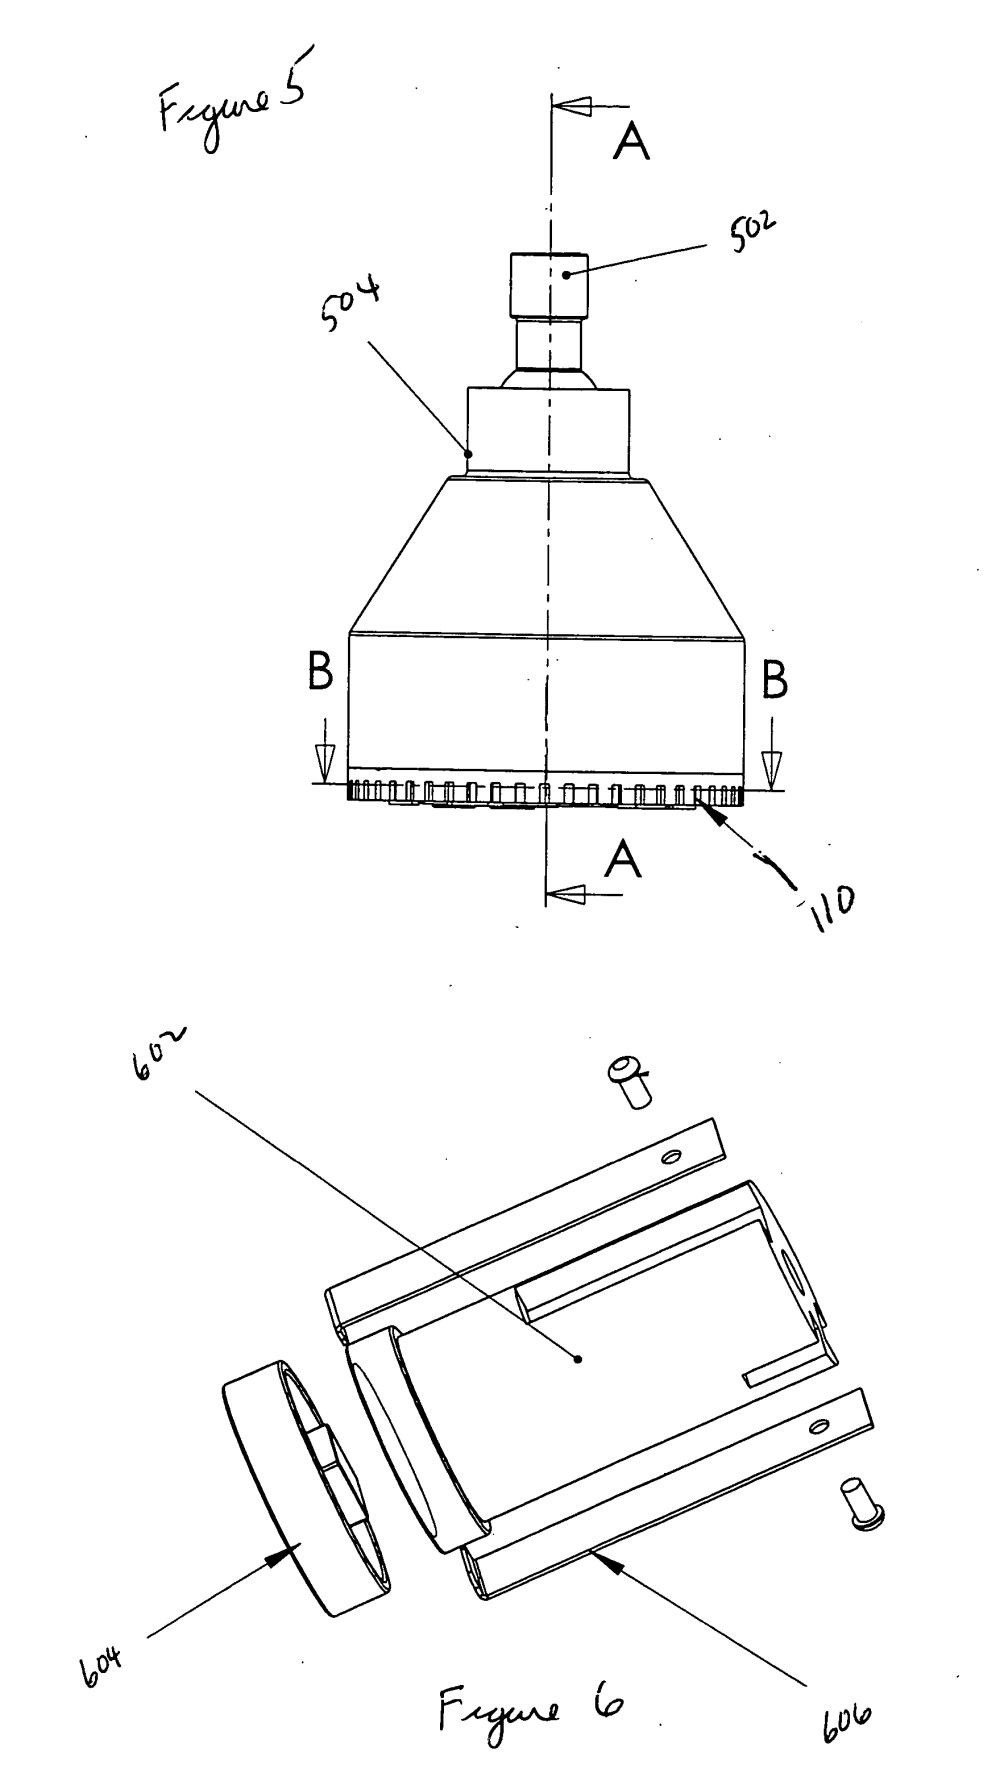 medium resolution of warn xd9000i wiring diagram